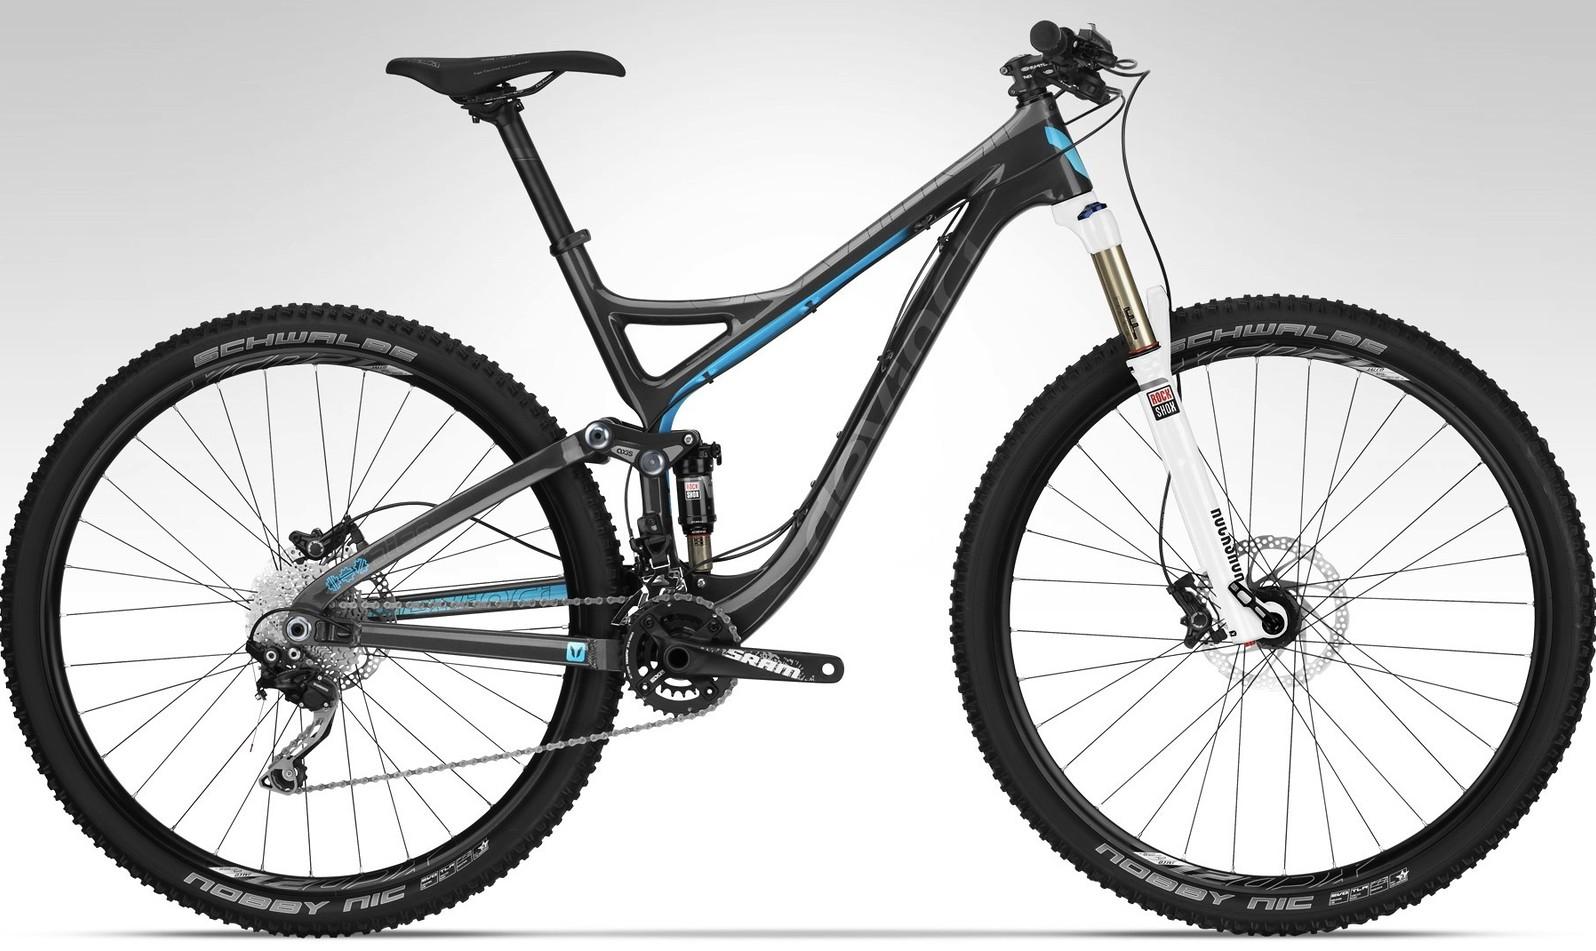 Devinci ATLAS CARBON XP bike